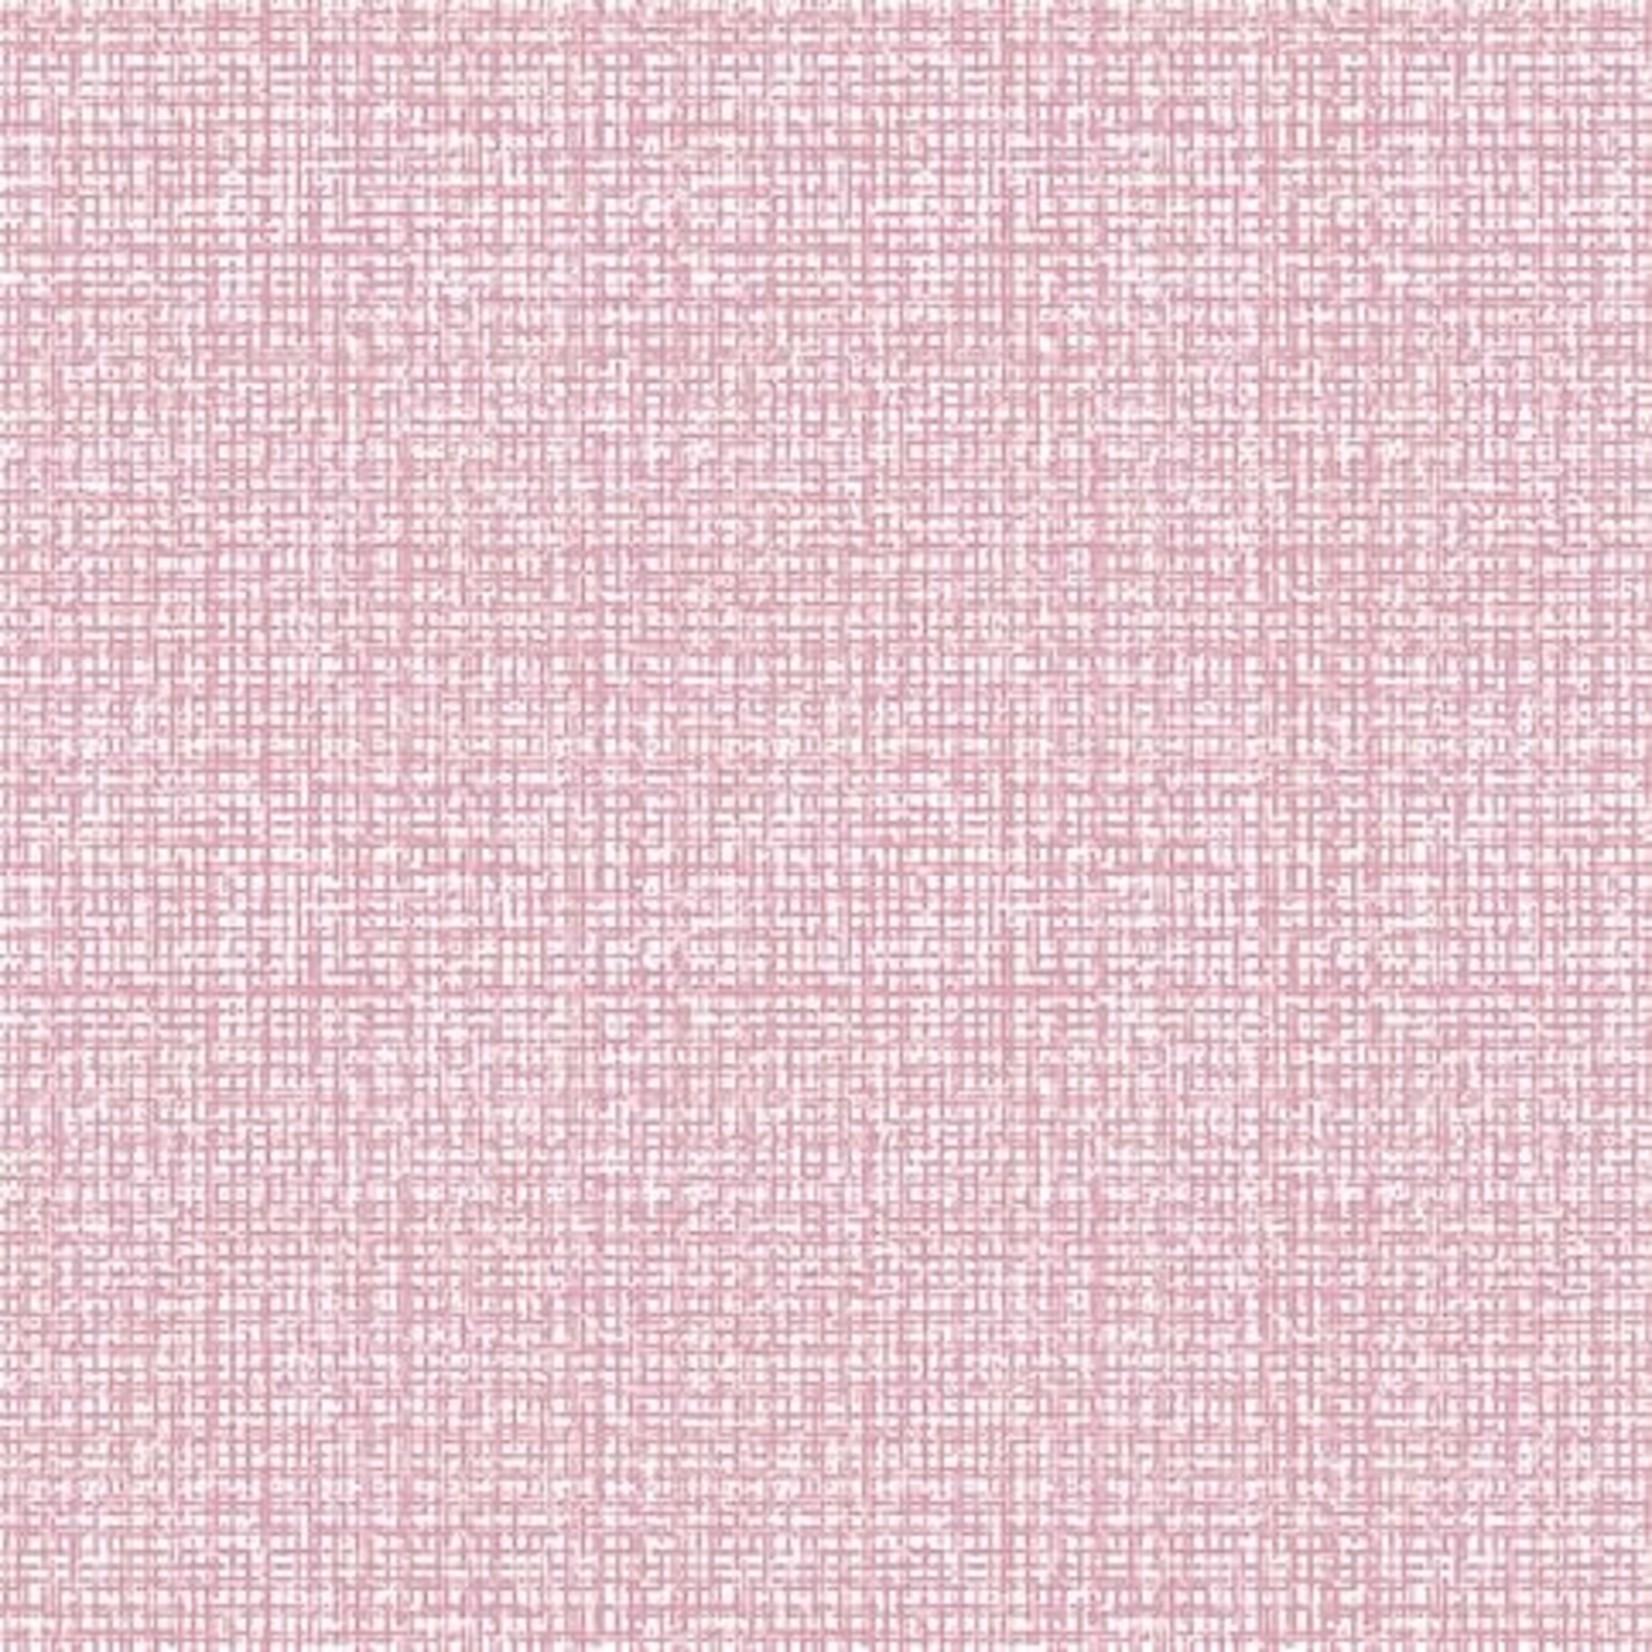 Contempo Studios Color - Weave - Pearl - Light - Pink